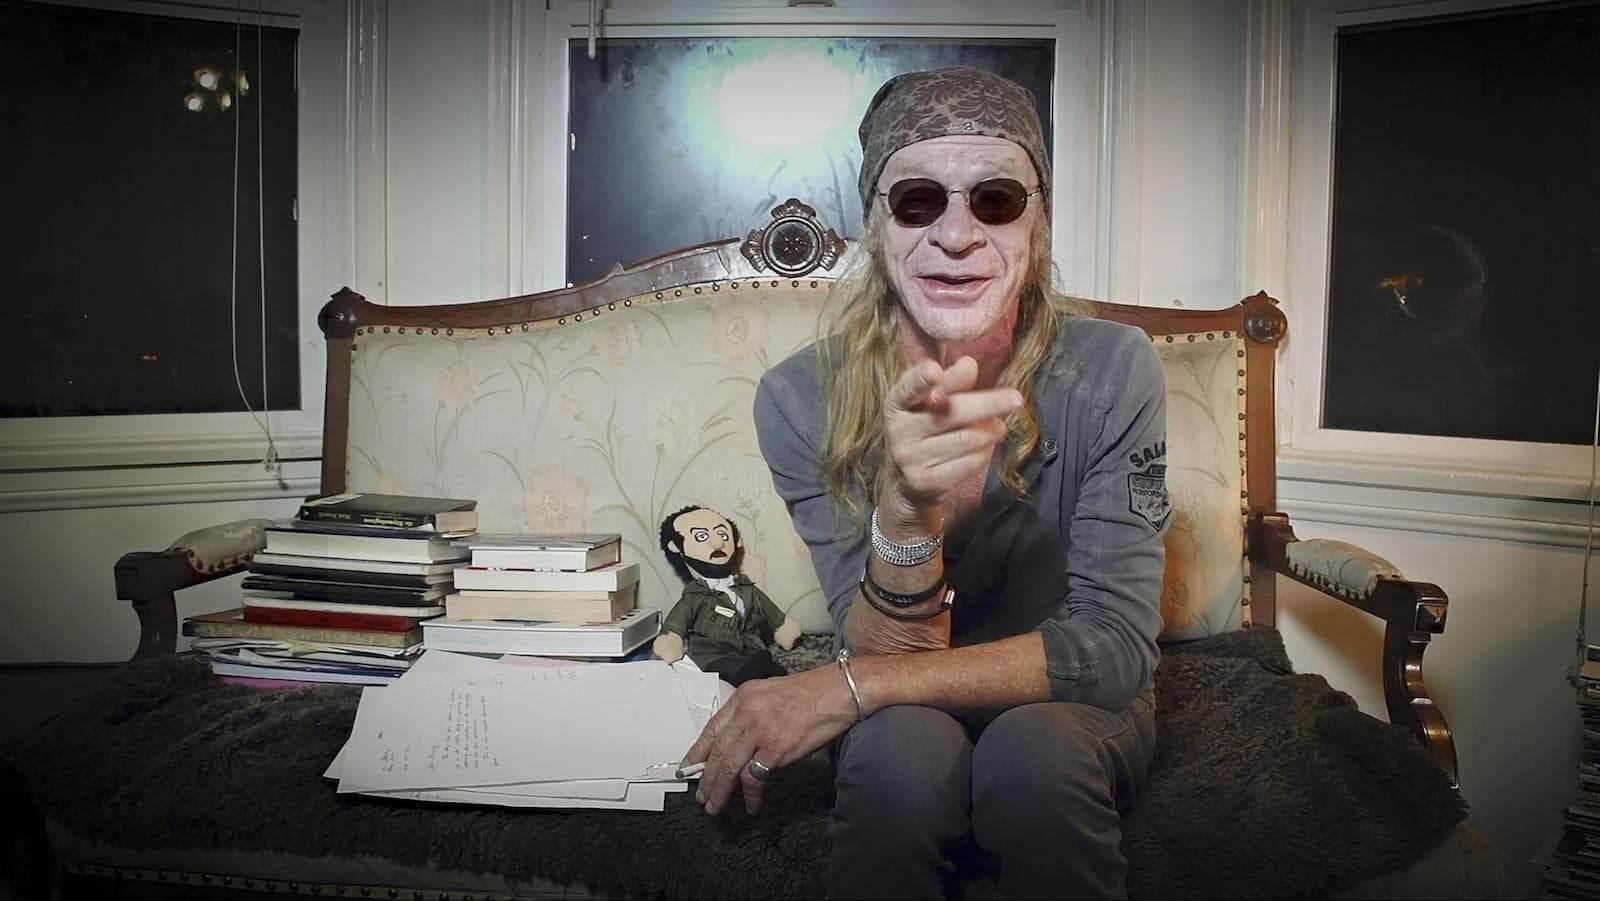 Best Indie FIlms - Leon Vitali - Filmworker - StudioBinder